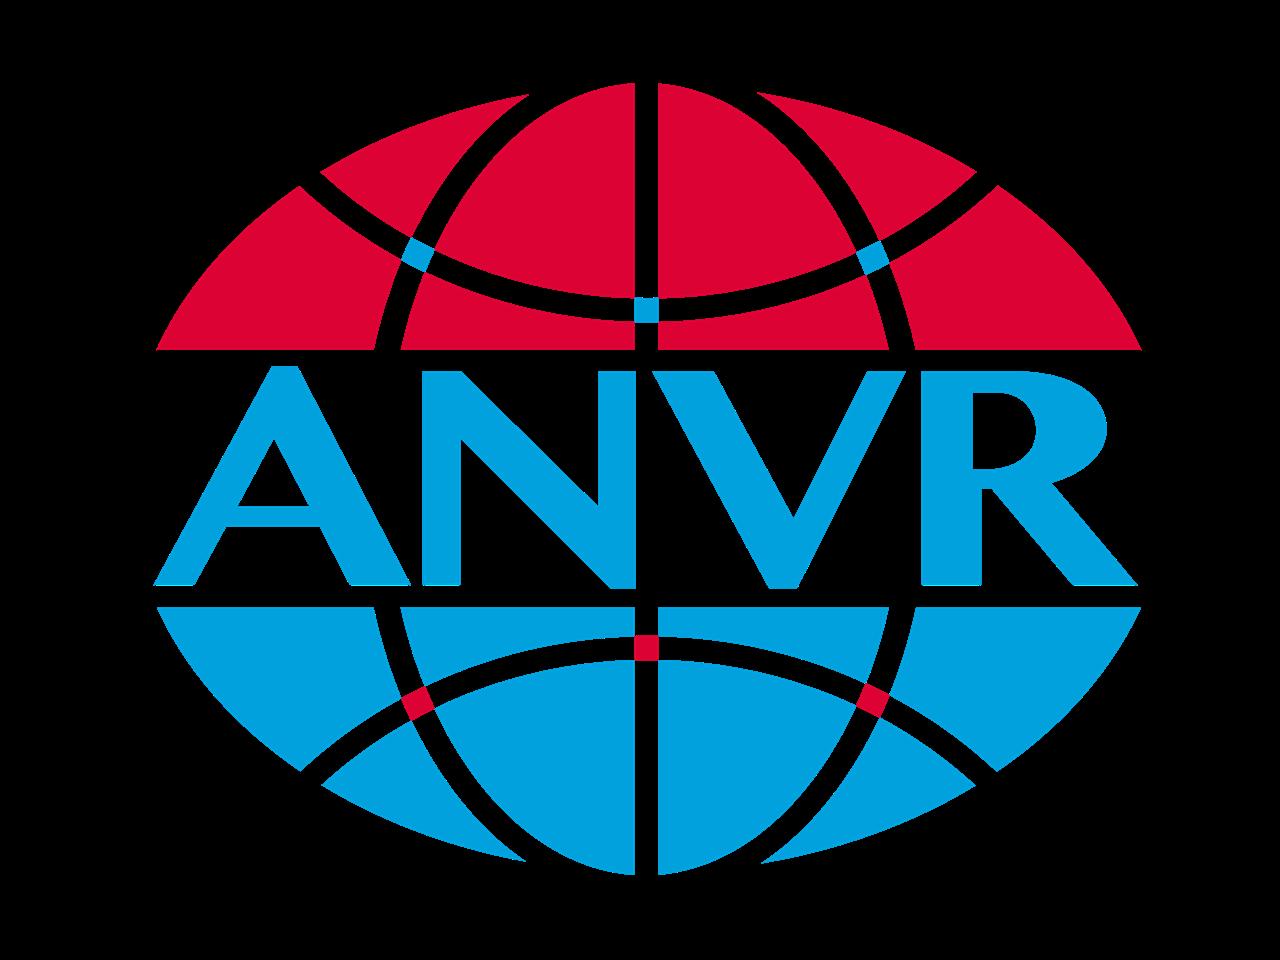 ANVR-logo-2019.png